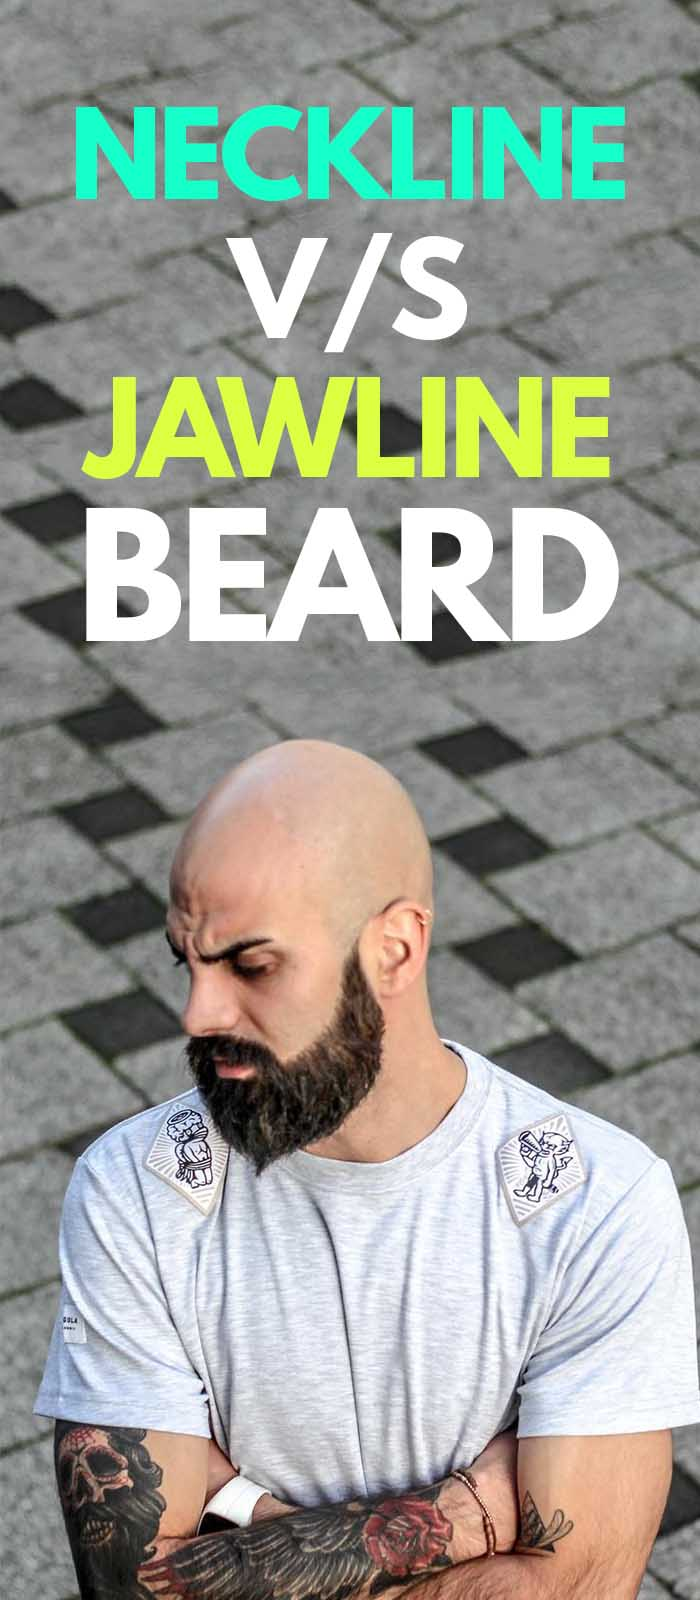 Neckline Beard VS Jawline Beard.